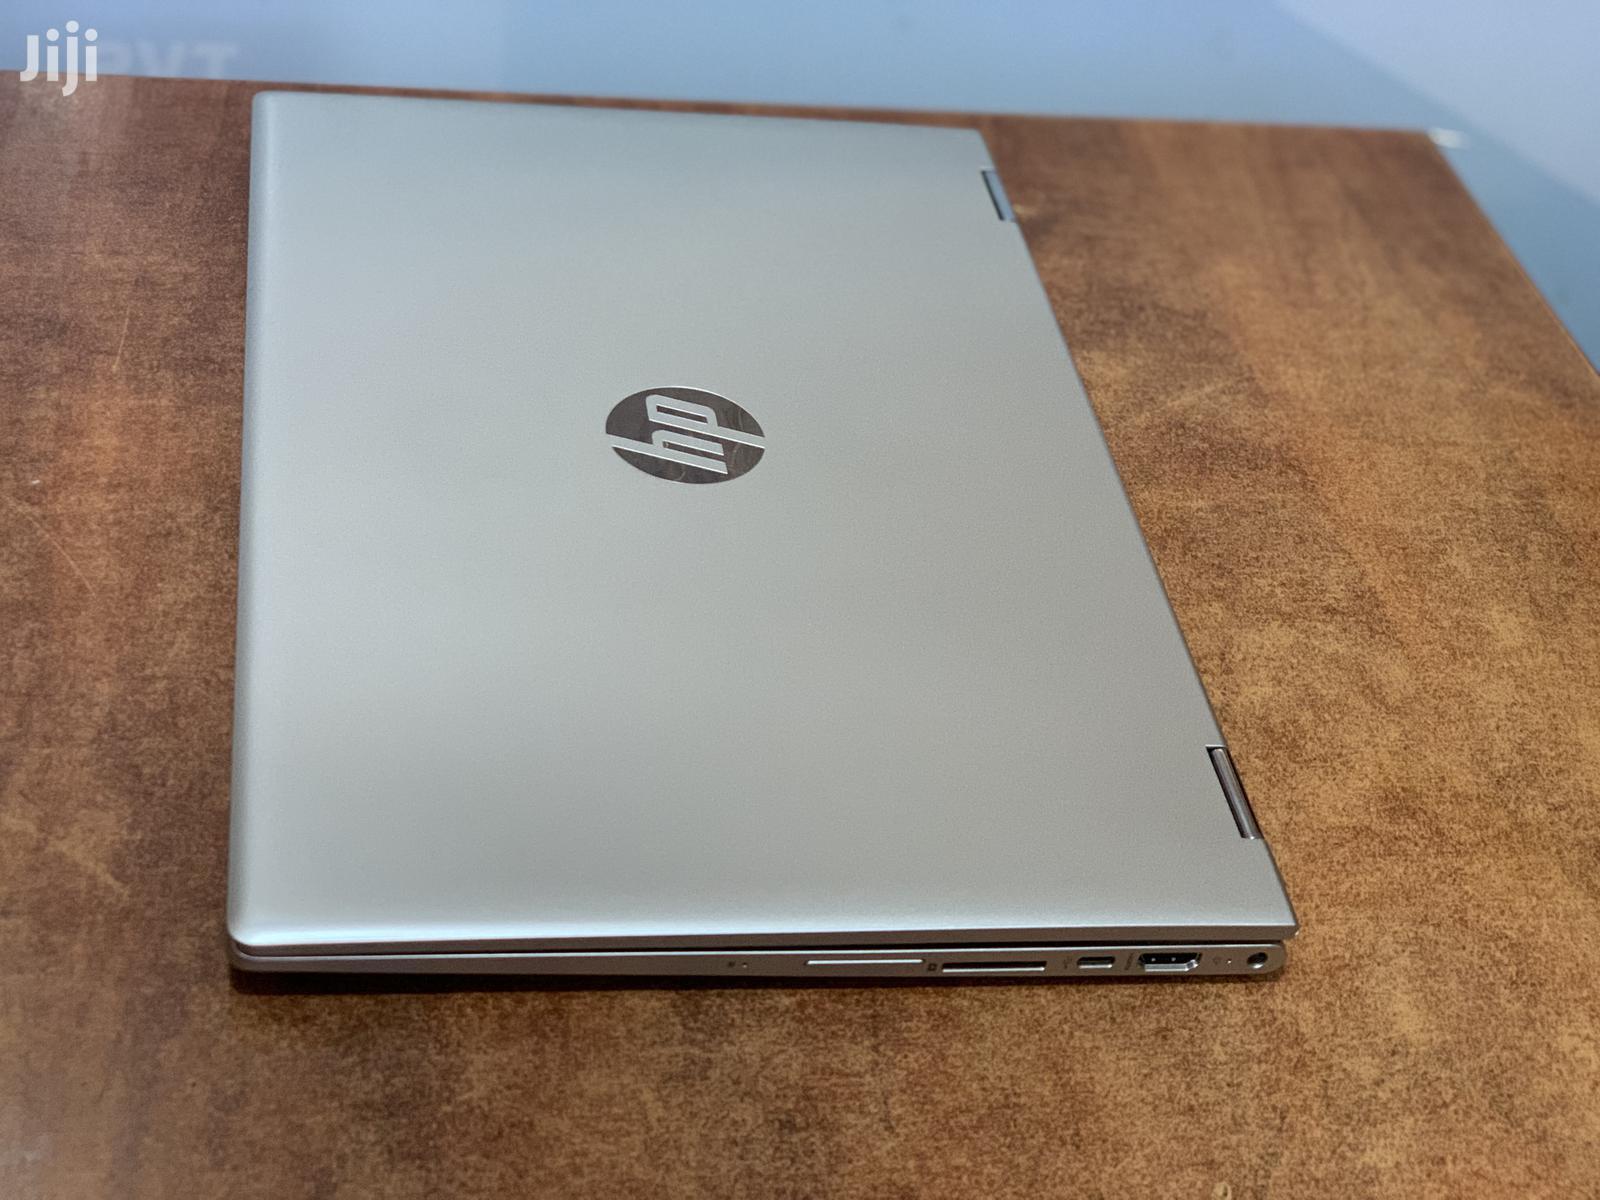 Laptop HP Pavilion X360 8GB Intel Core I5 SSHD (Hybrid) 500GB   Laptops & Computers for sale in Kampala, Central Region, Uganda